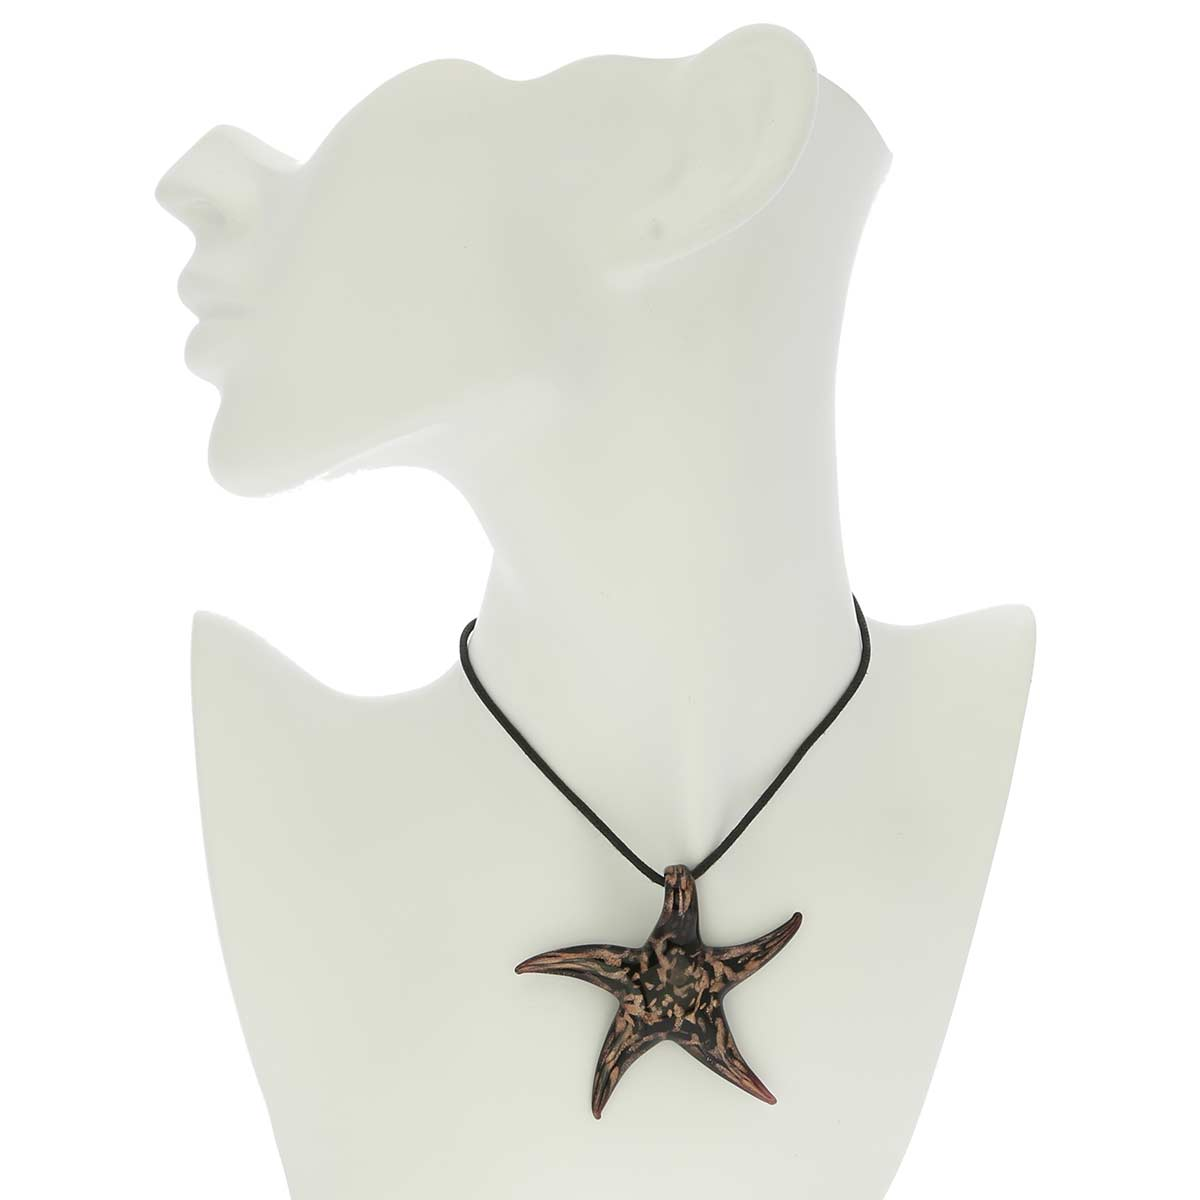 Avventurina Black and Champagne Starfish pendant